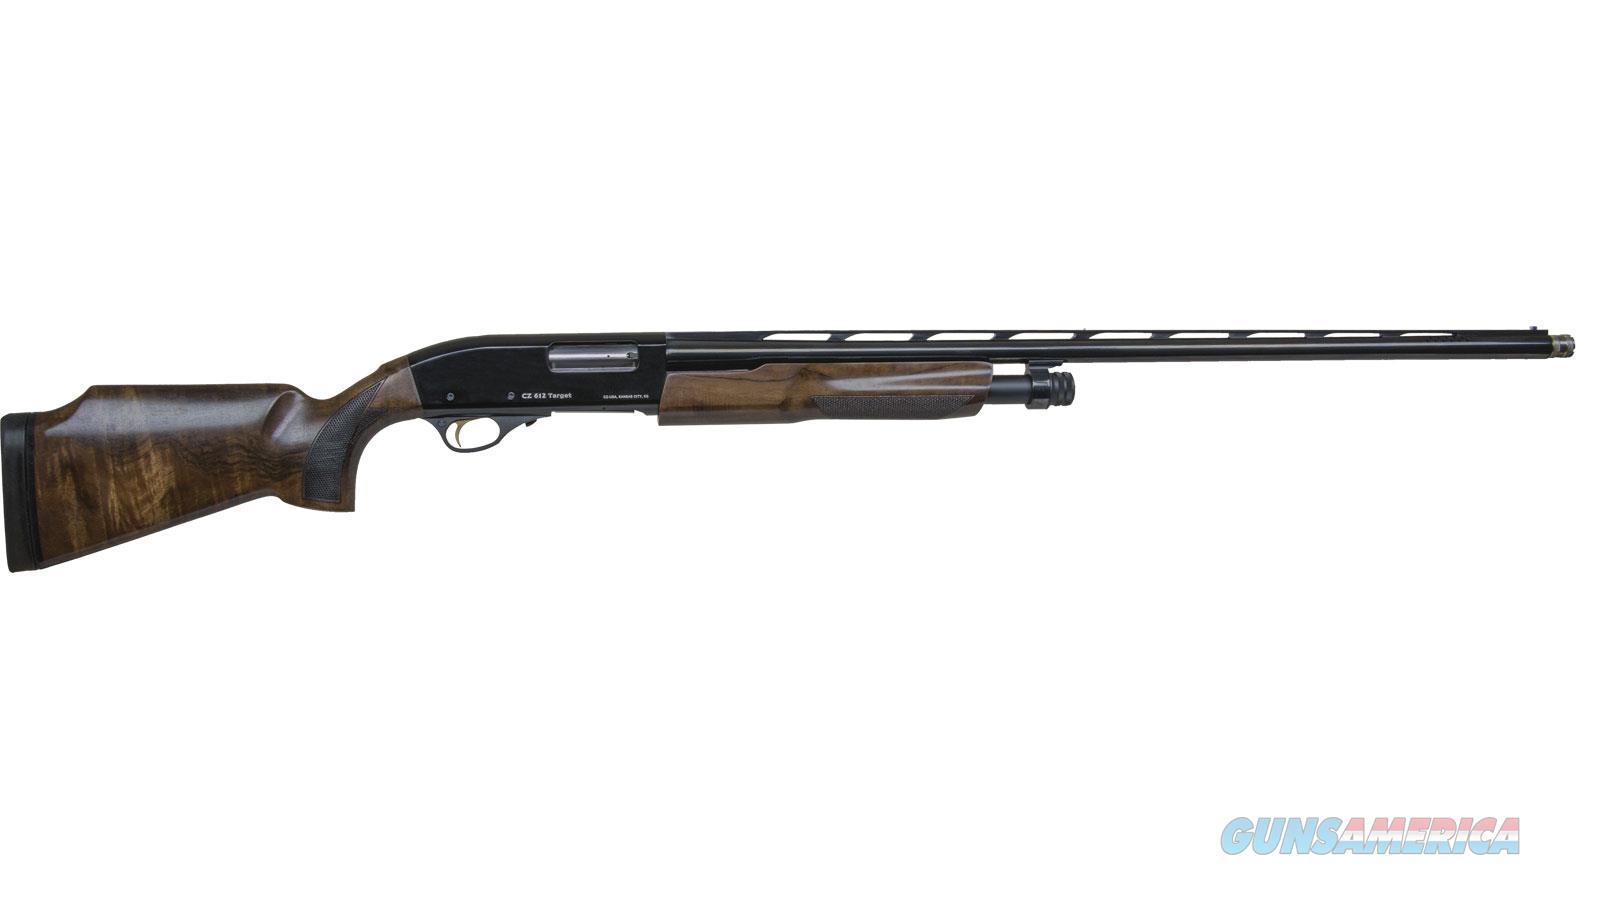 "Cz Usa 612 Target 12G 32"" 4Rd 06578  Guns > Shotguns > C Misc Shotguns"